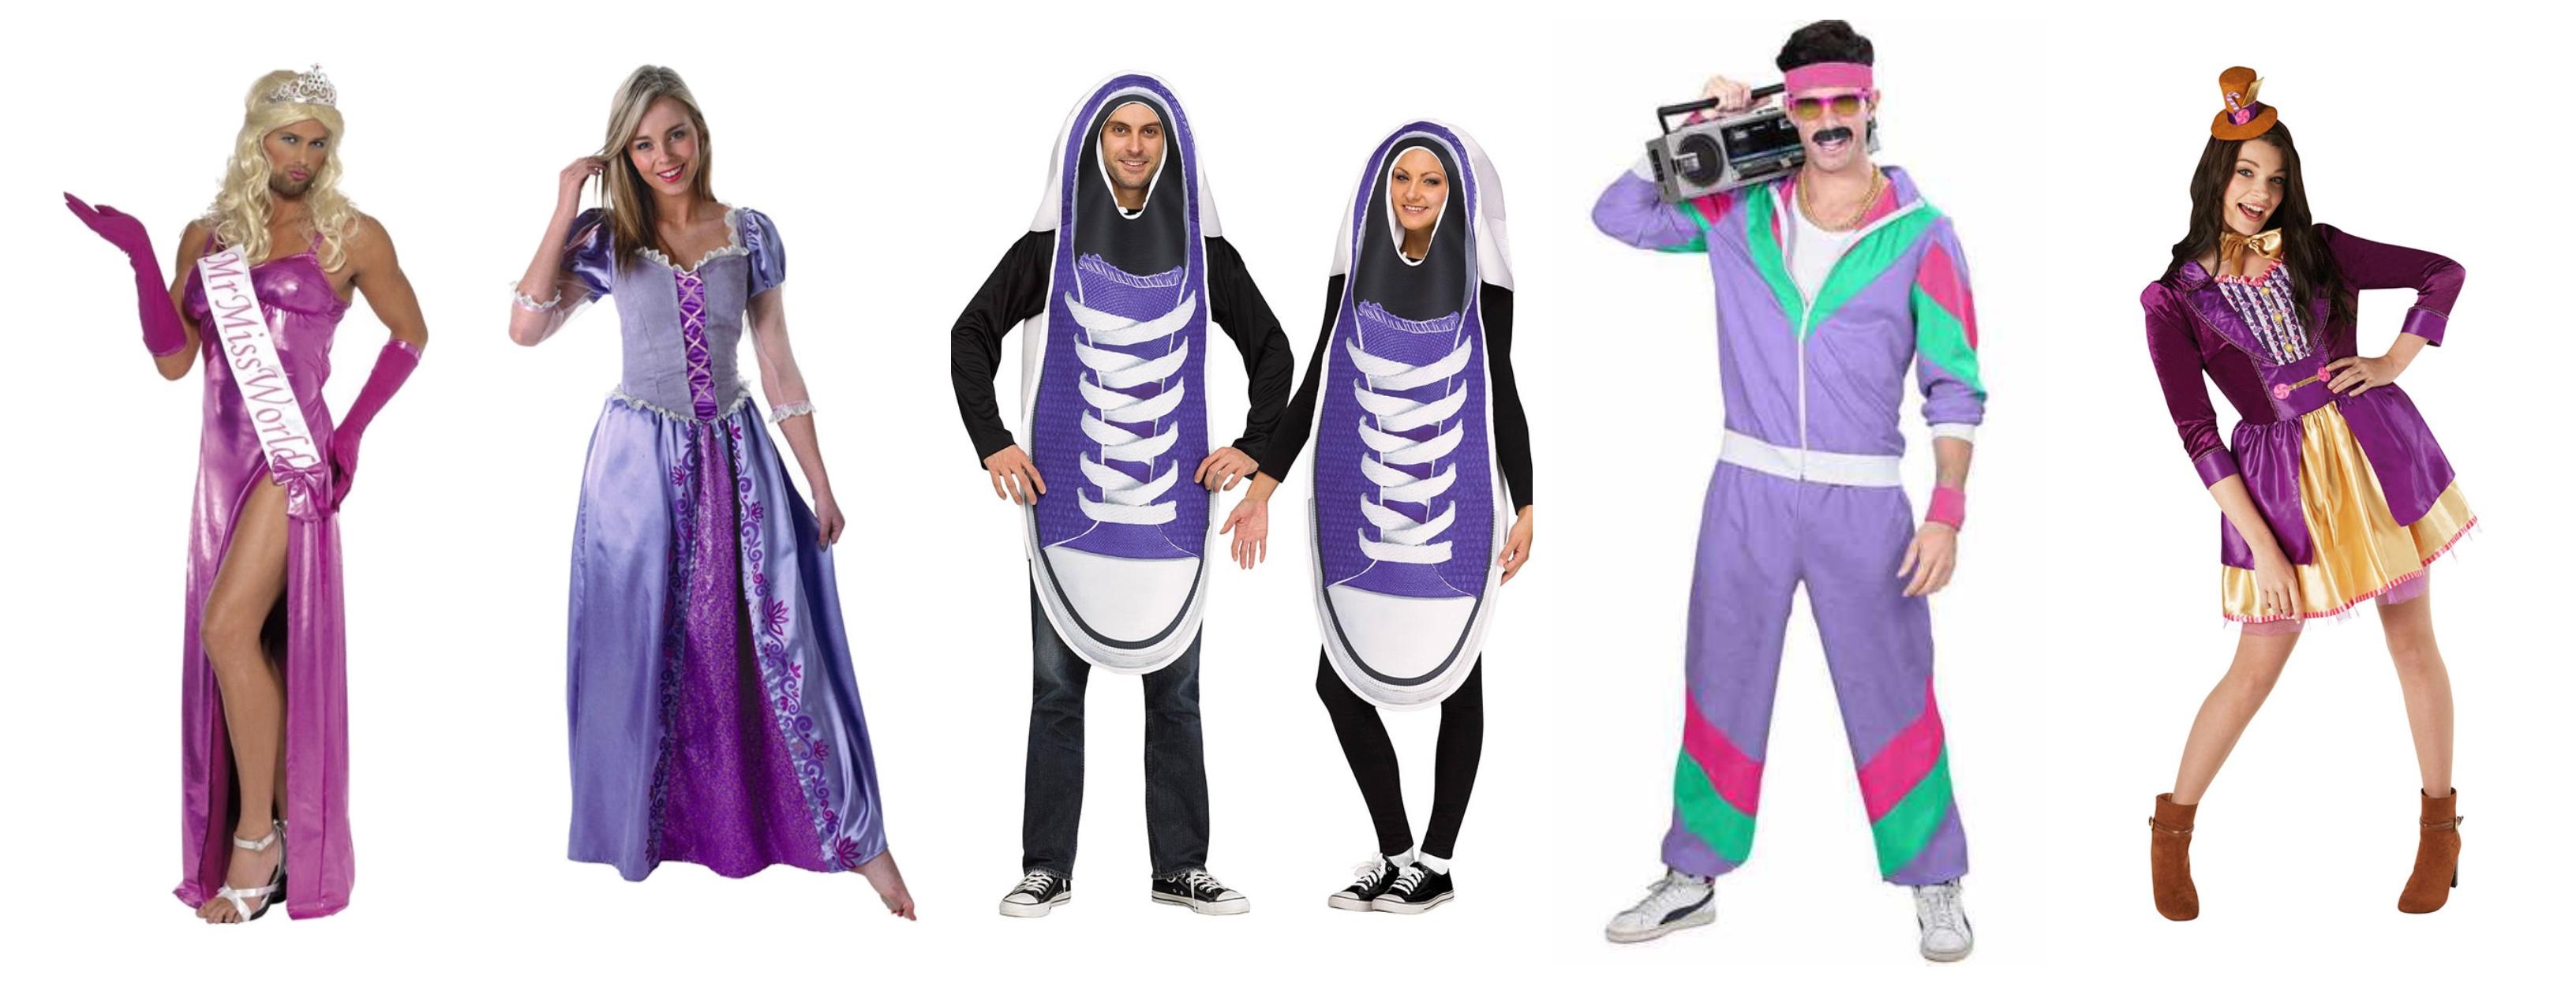 lilla voksenkostumer lilla kostumer til voksne - Lilla kostumer til voksne